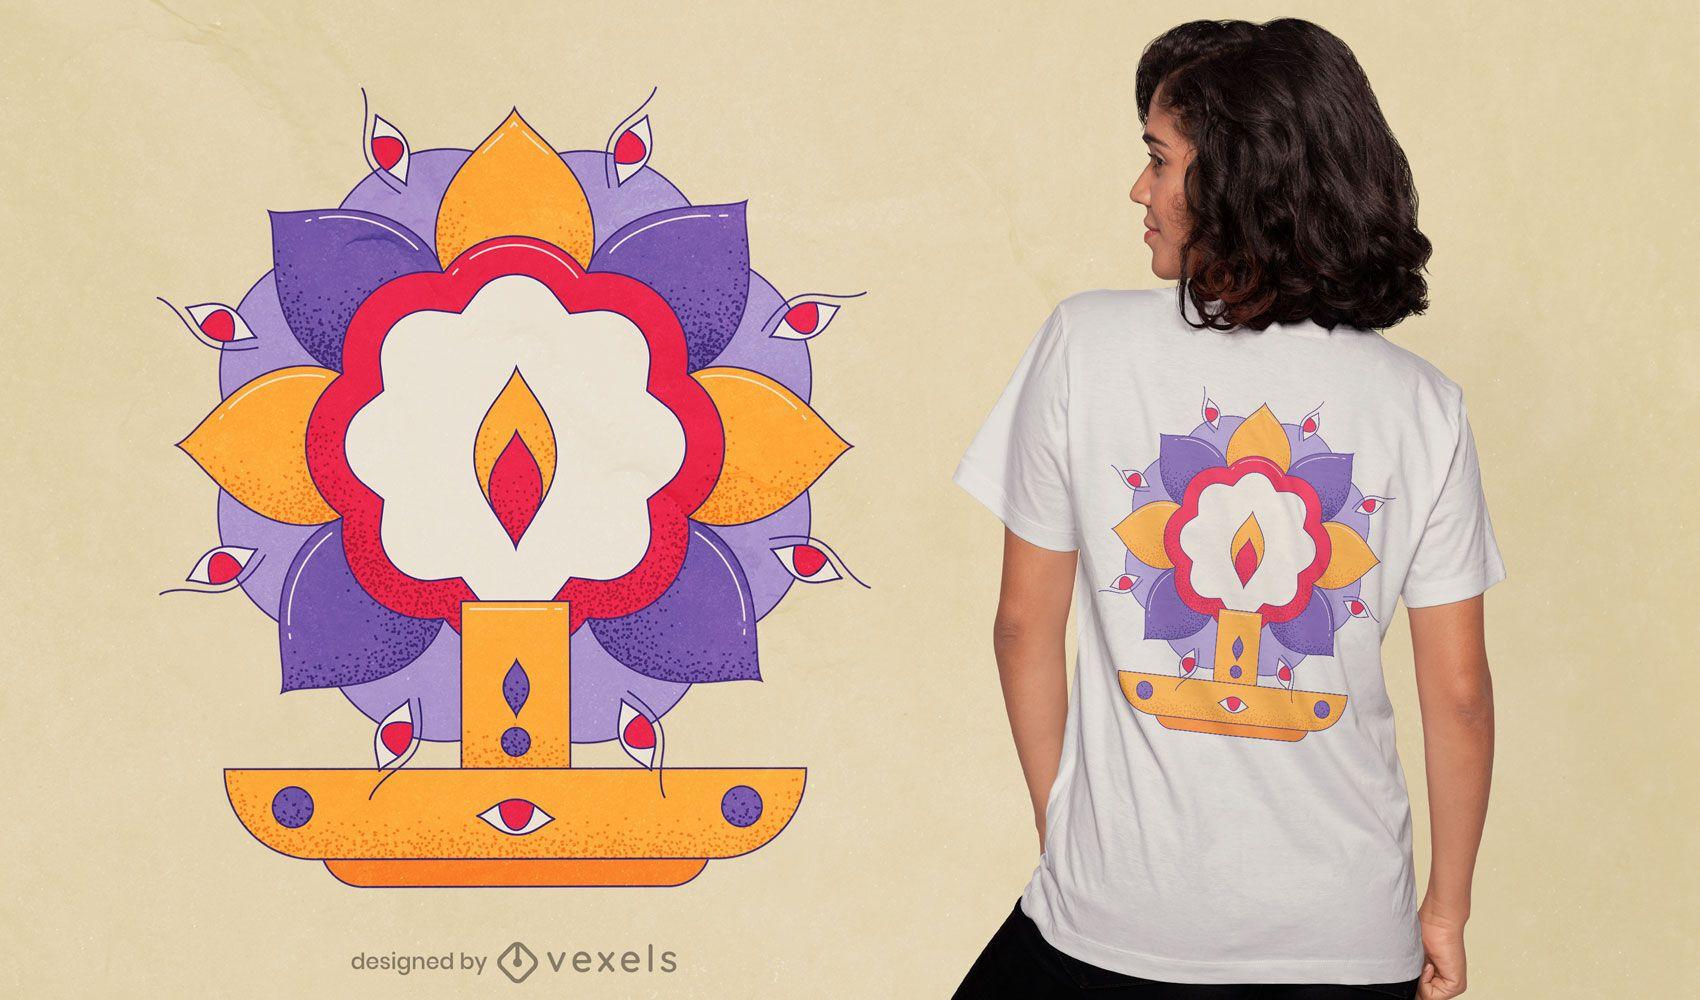 Durga puja t-shirt design